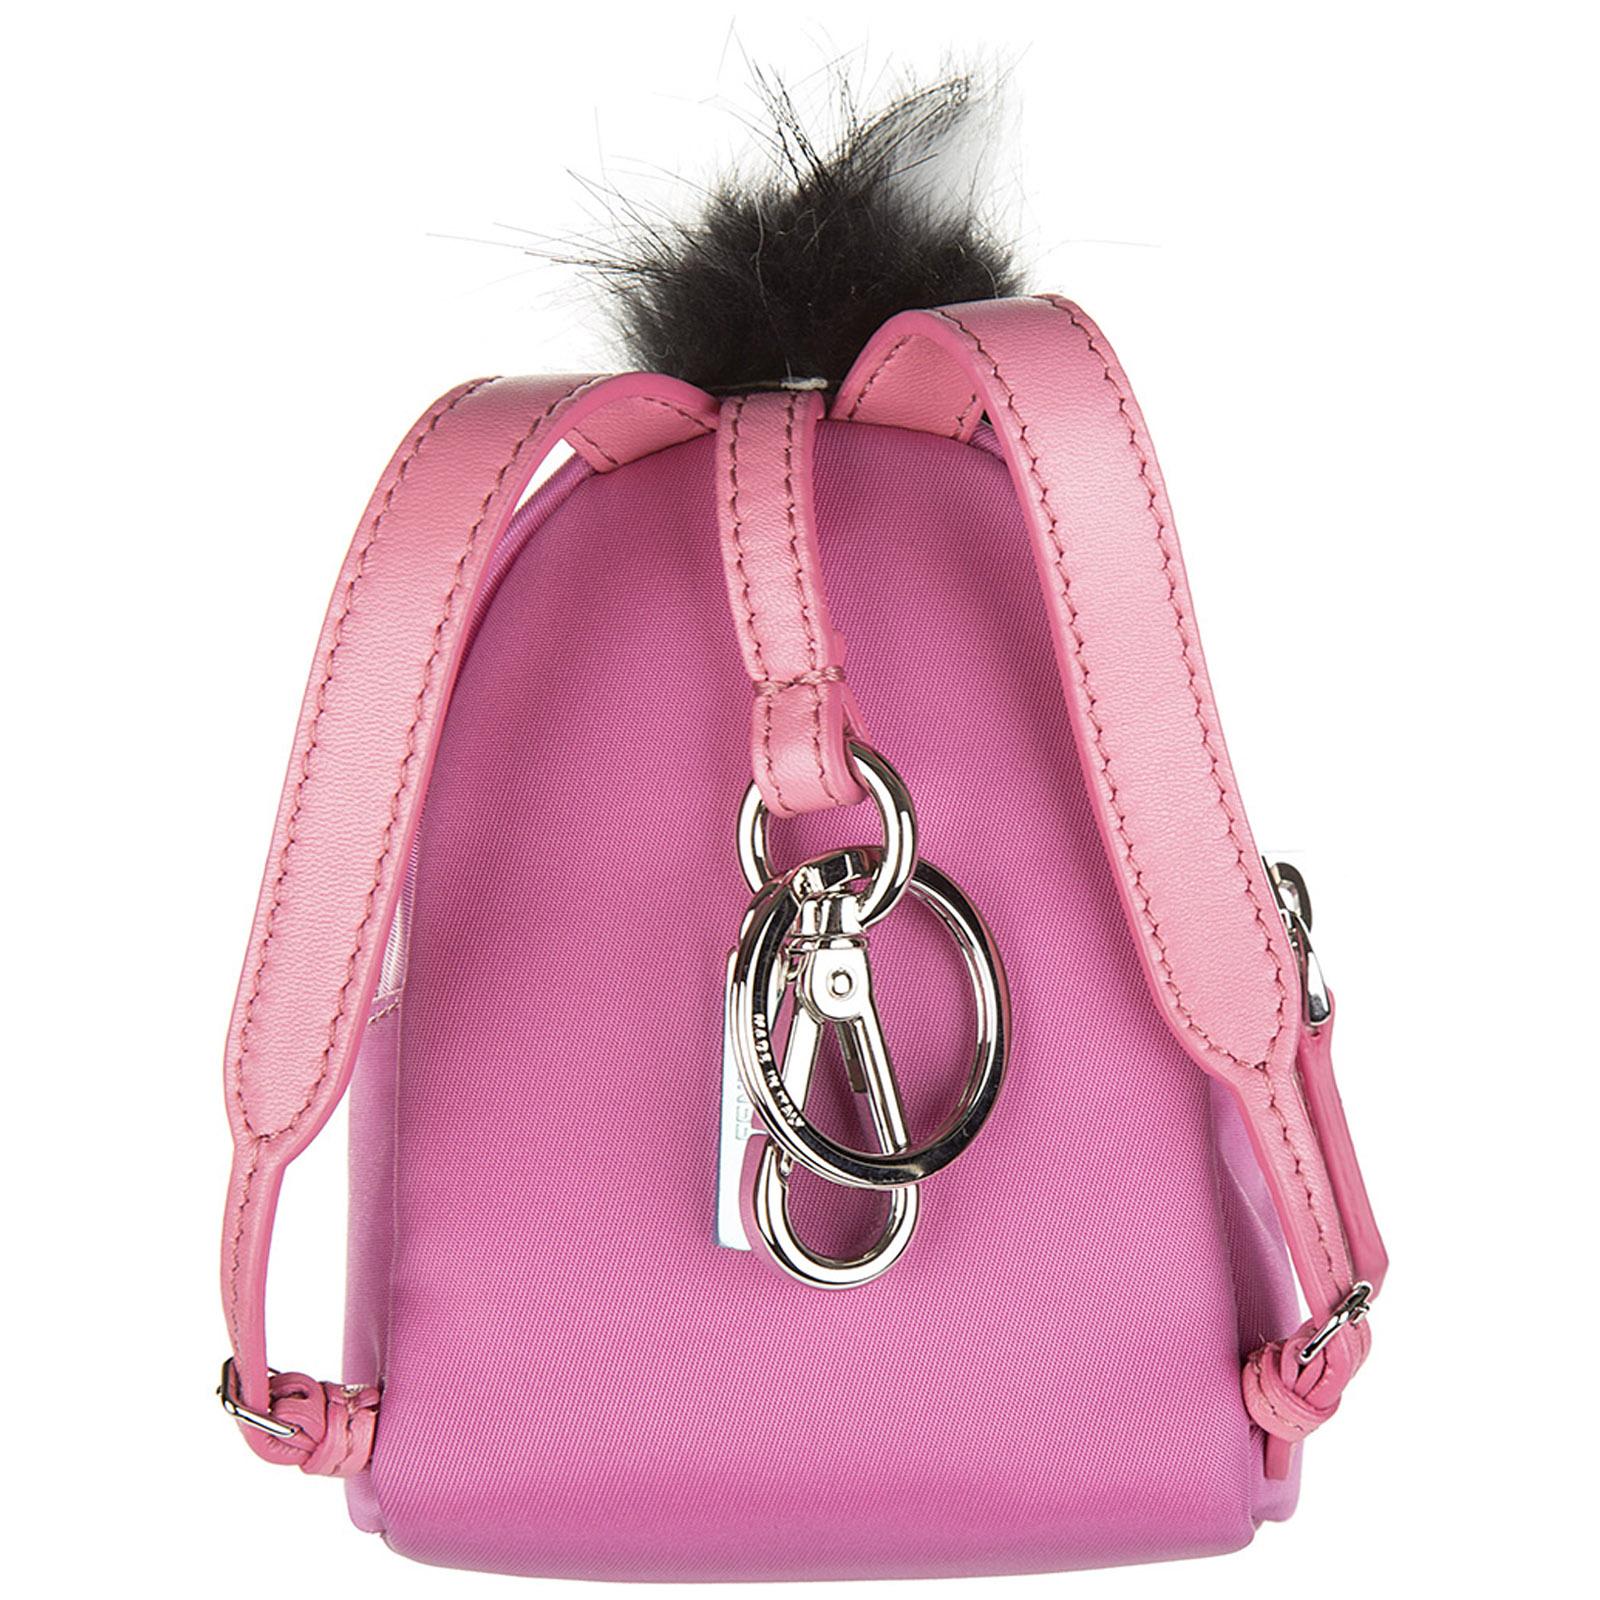 Women's bag charm bag bugs